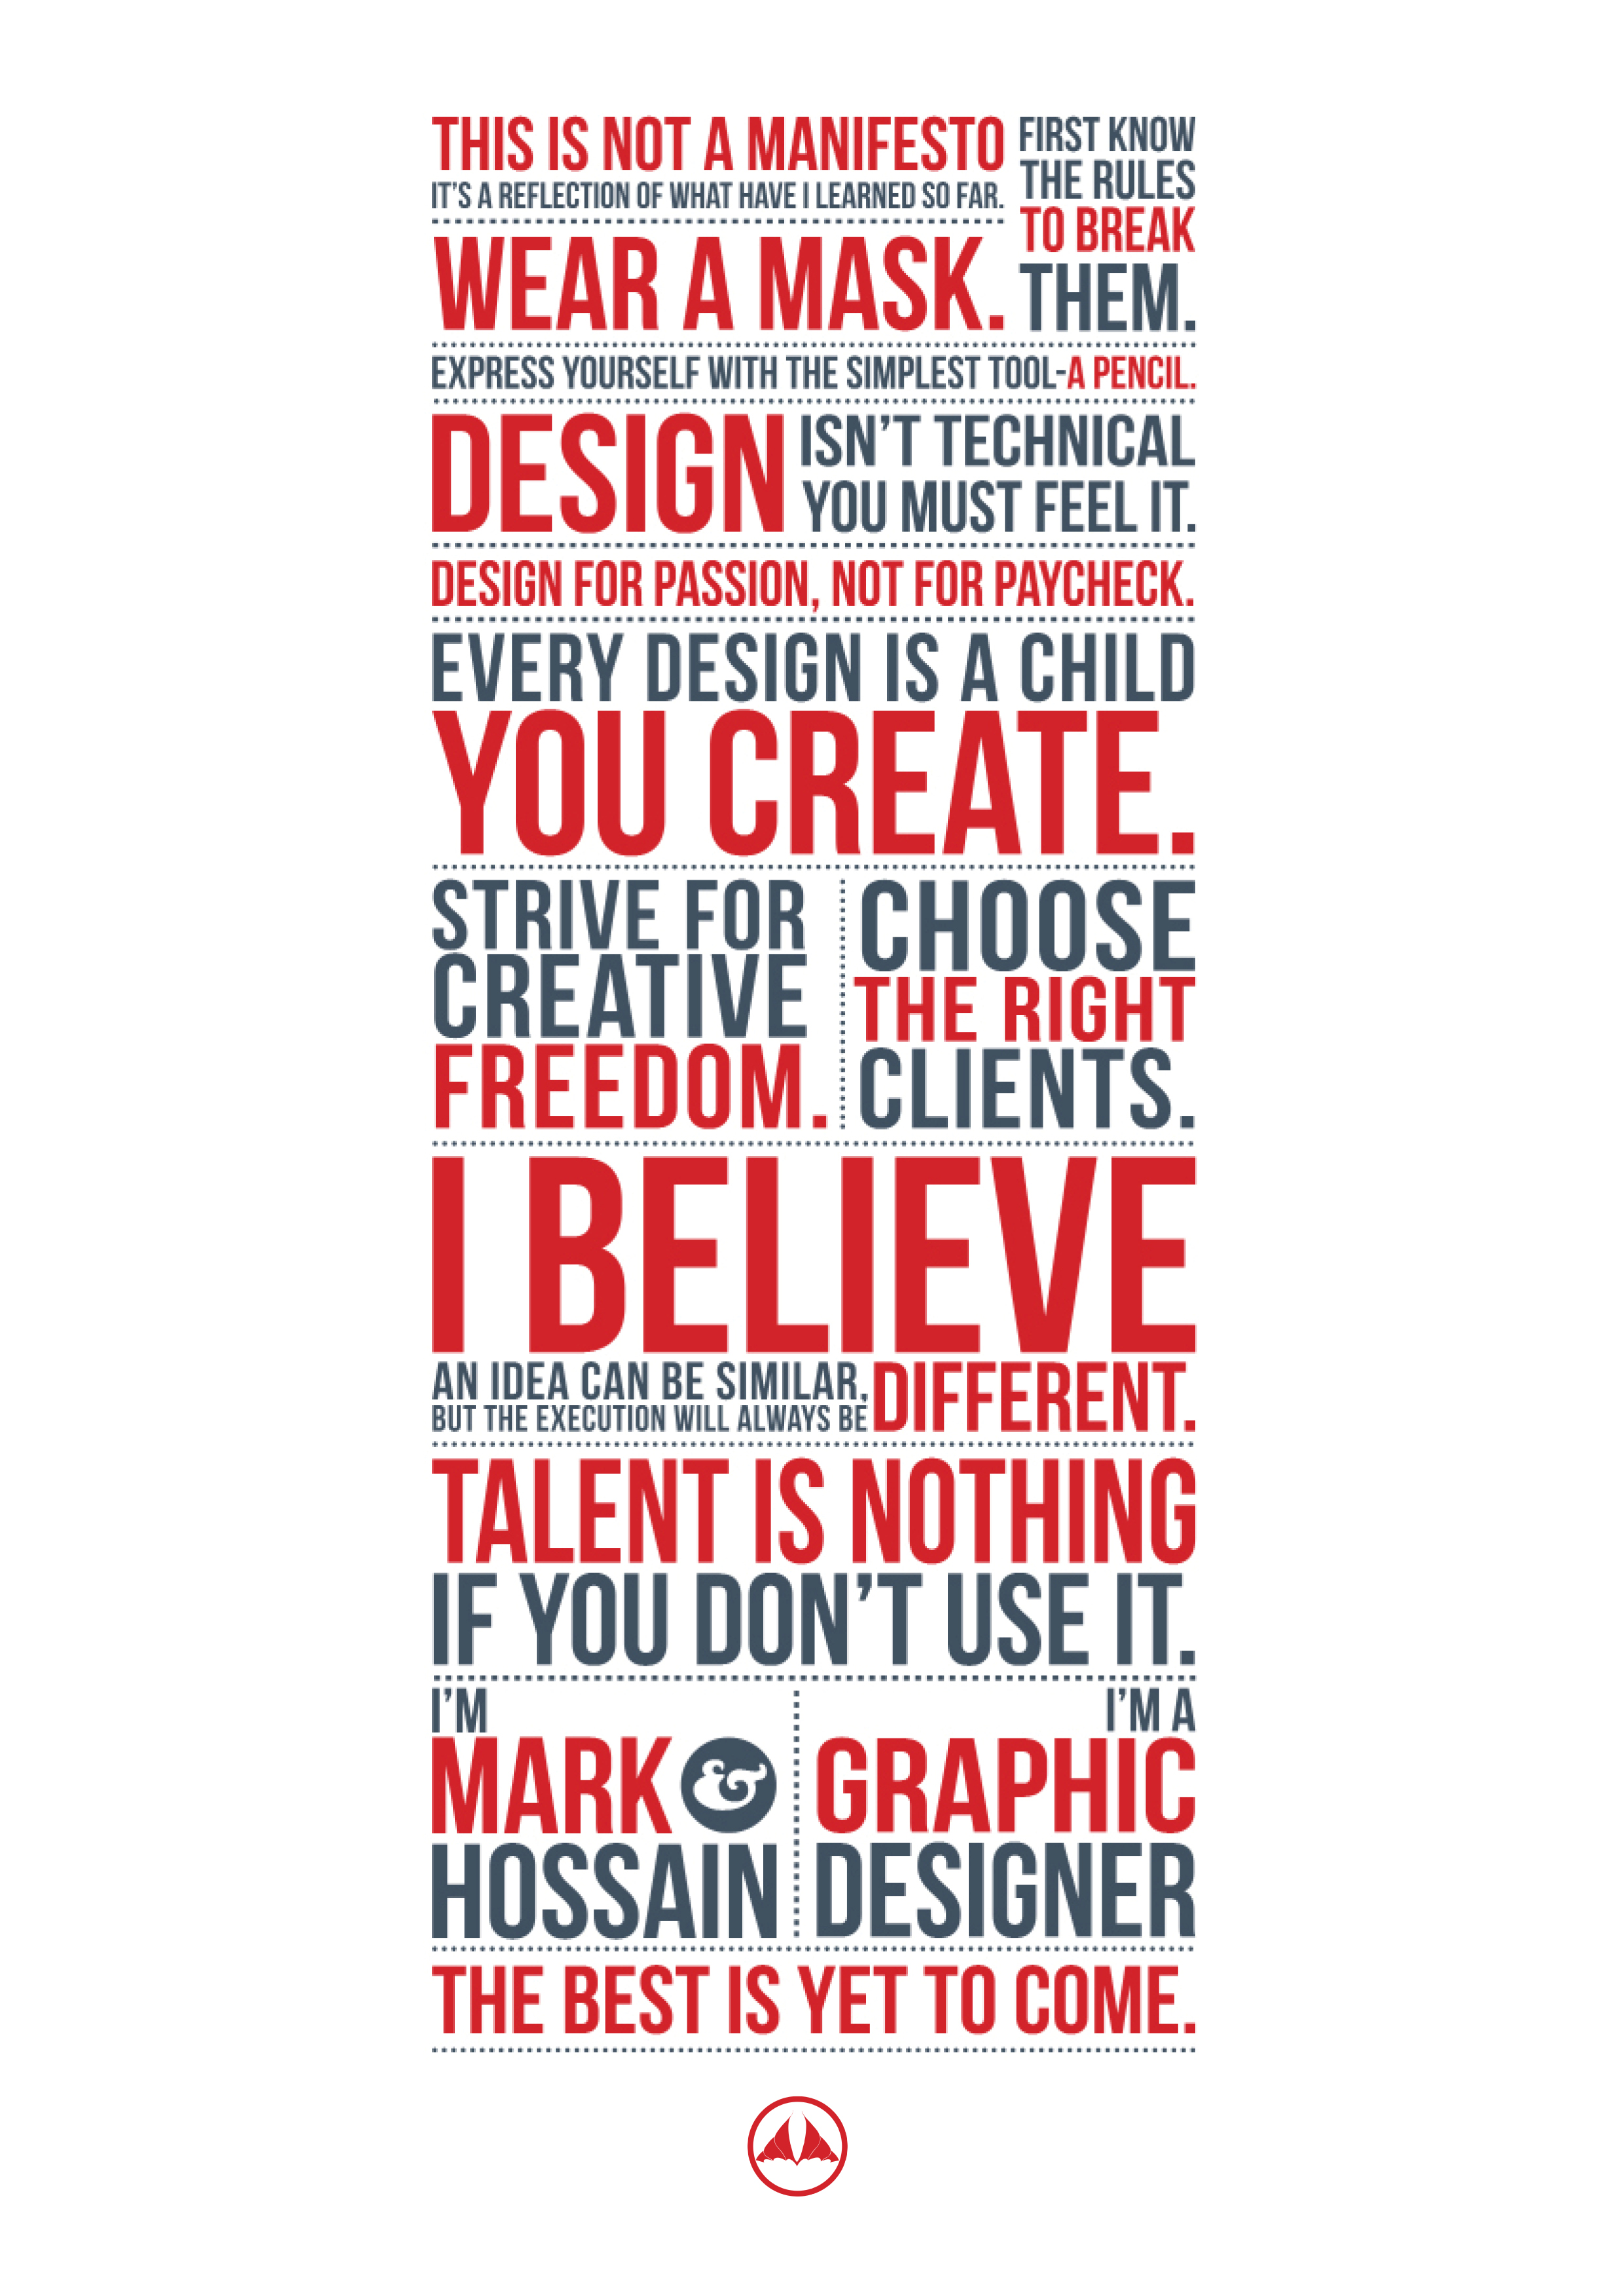 My manifesto -A3